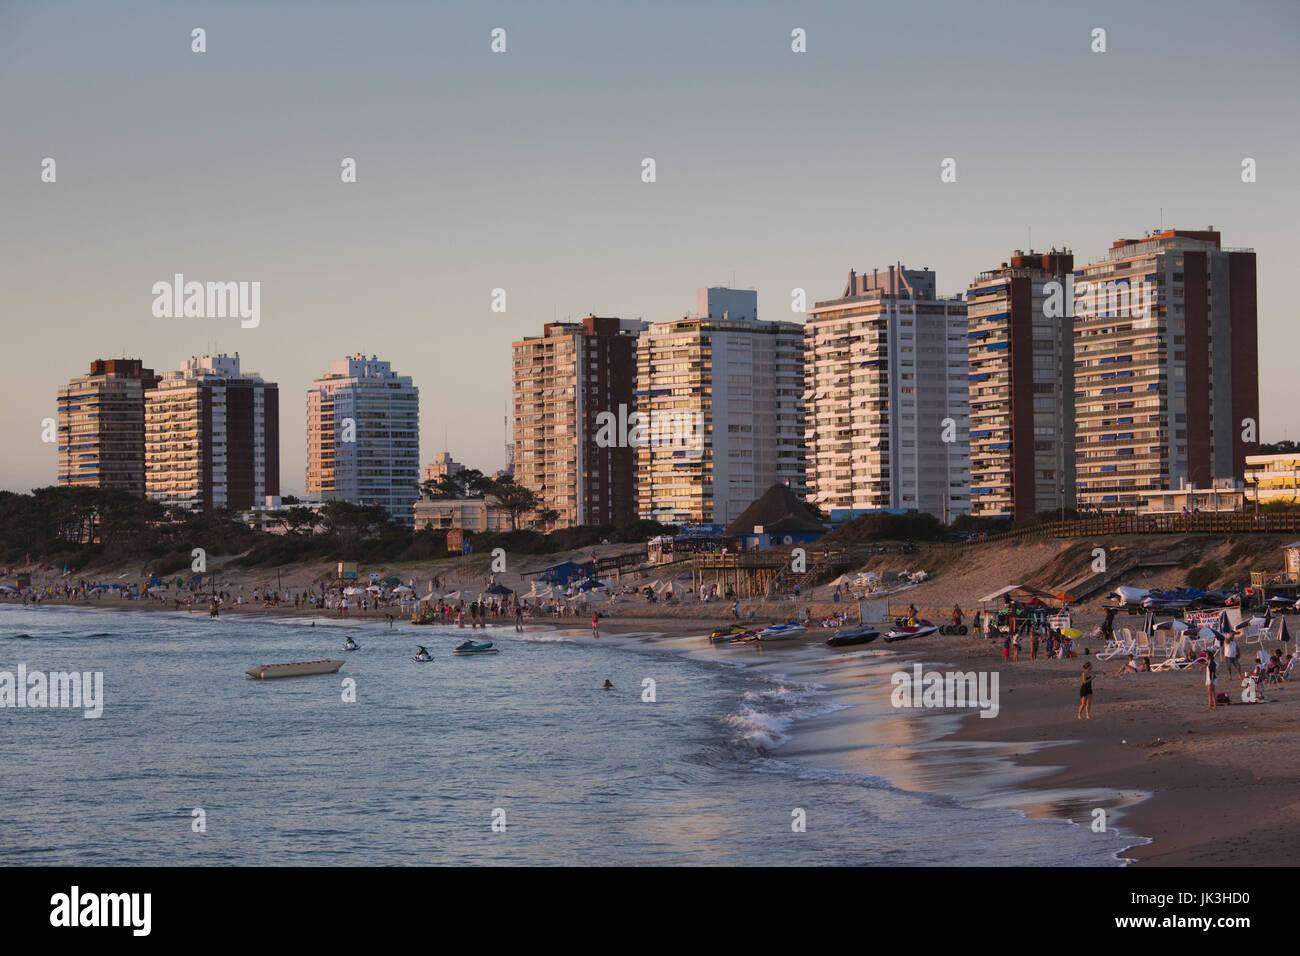 Uruguay, Punta del Este, condo towers by Playa Mansa beach, sunset - Stock Image